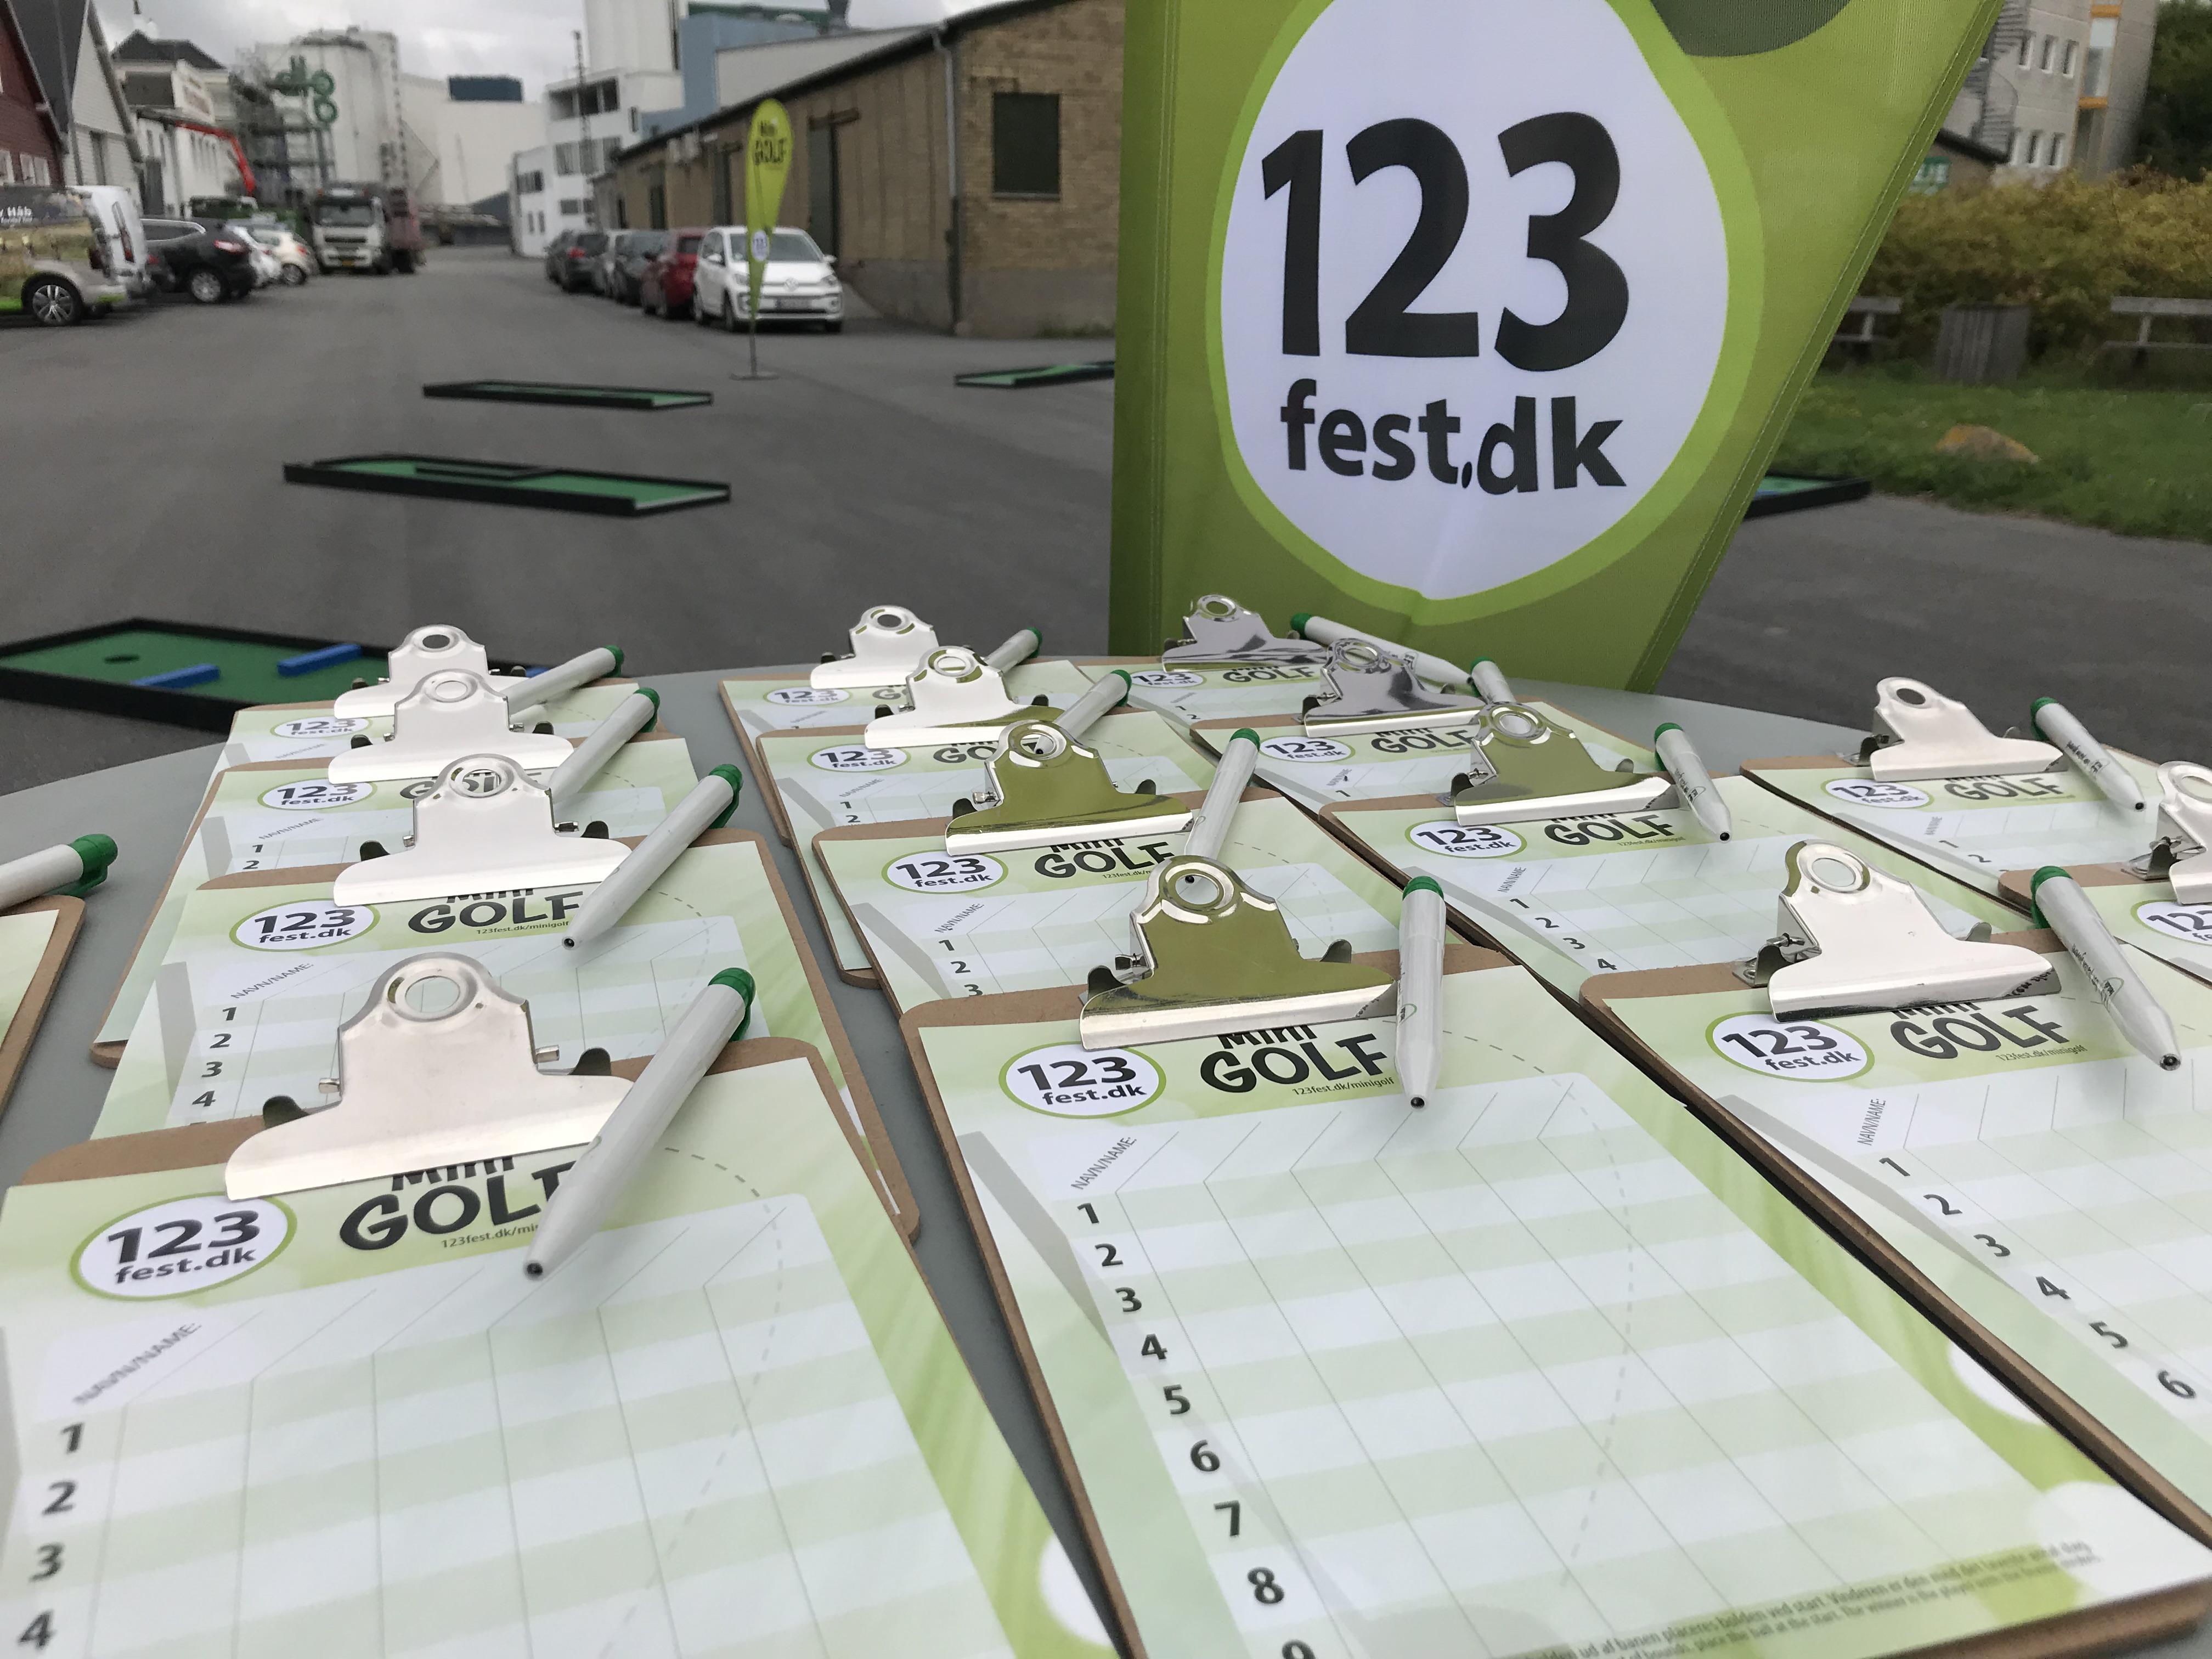 Minigolf event Dok5000 i Odense